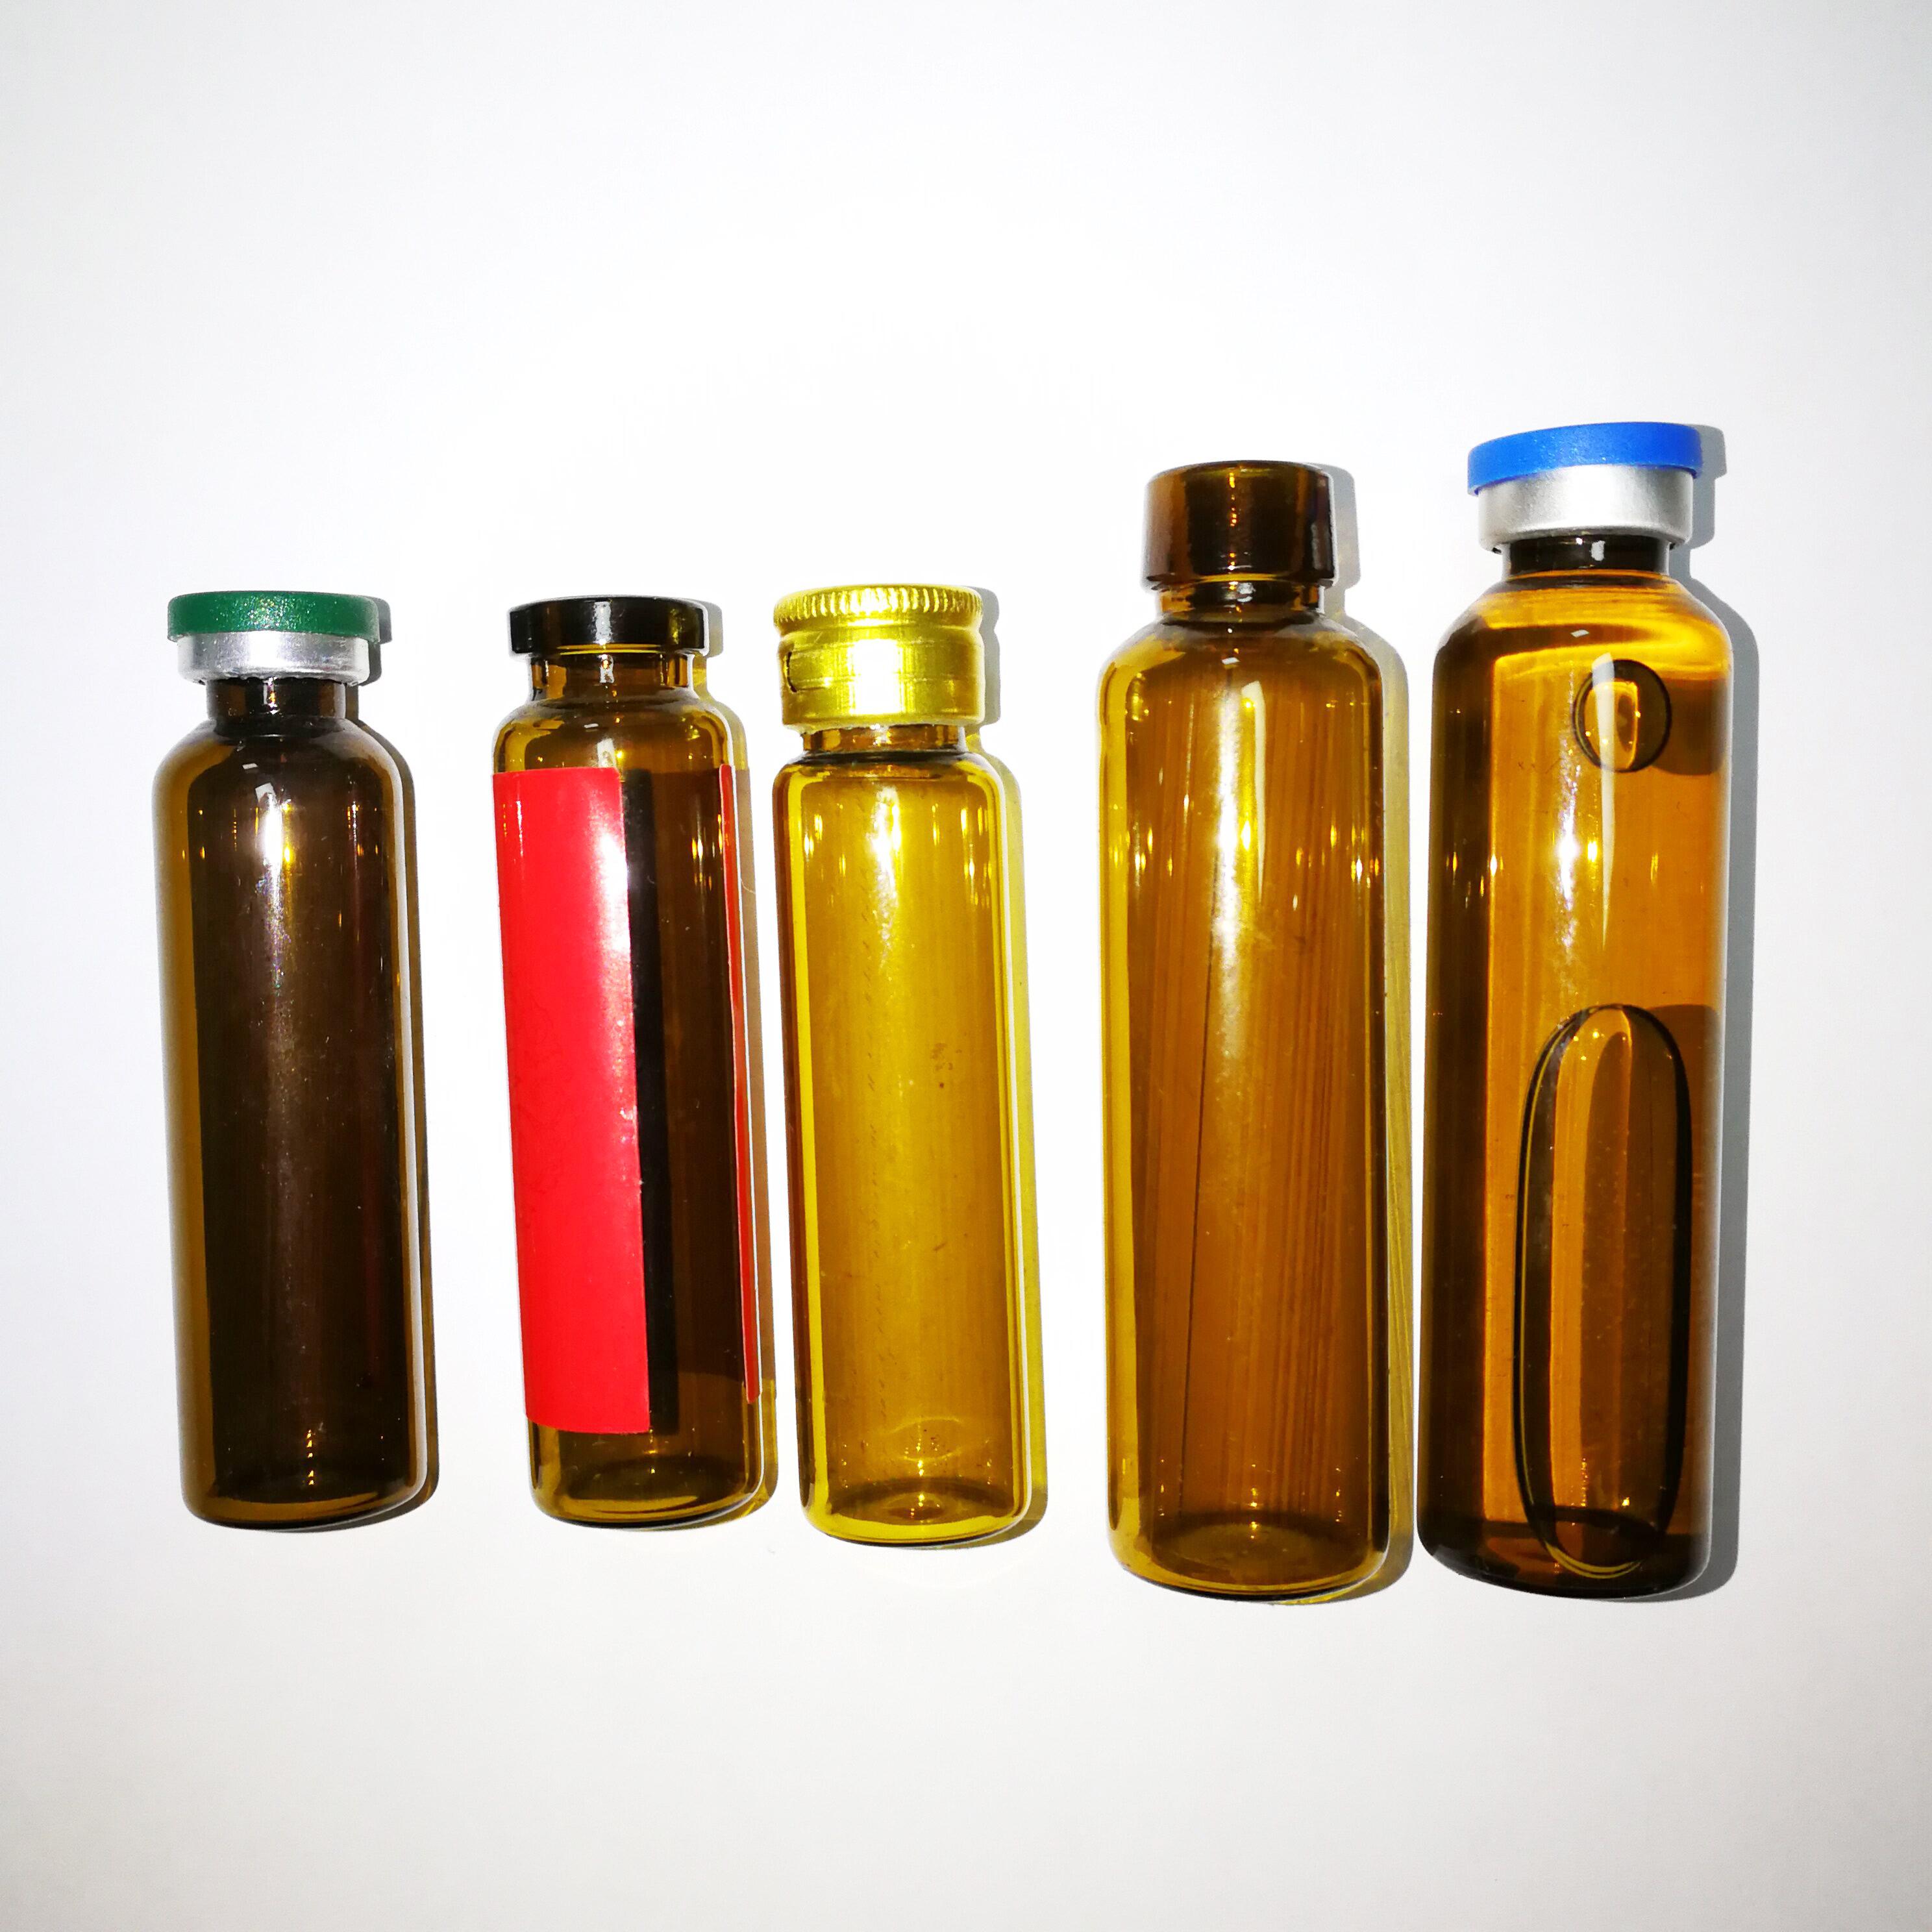 10-20ml口服液瓶子